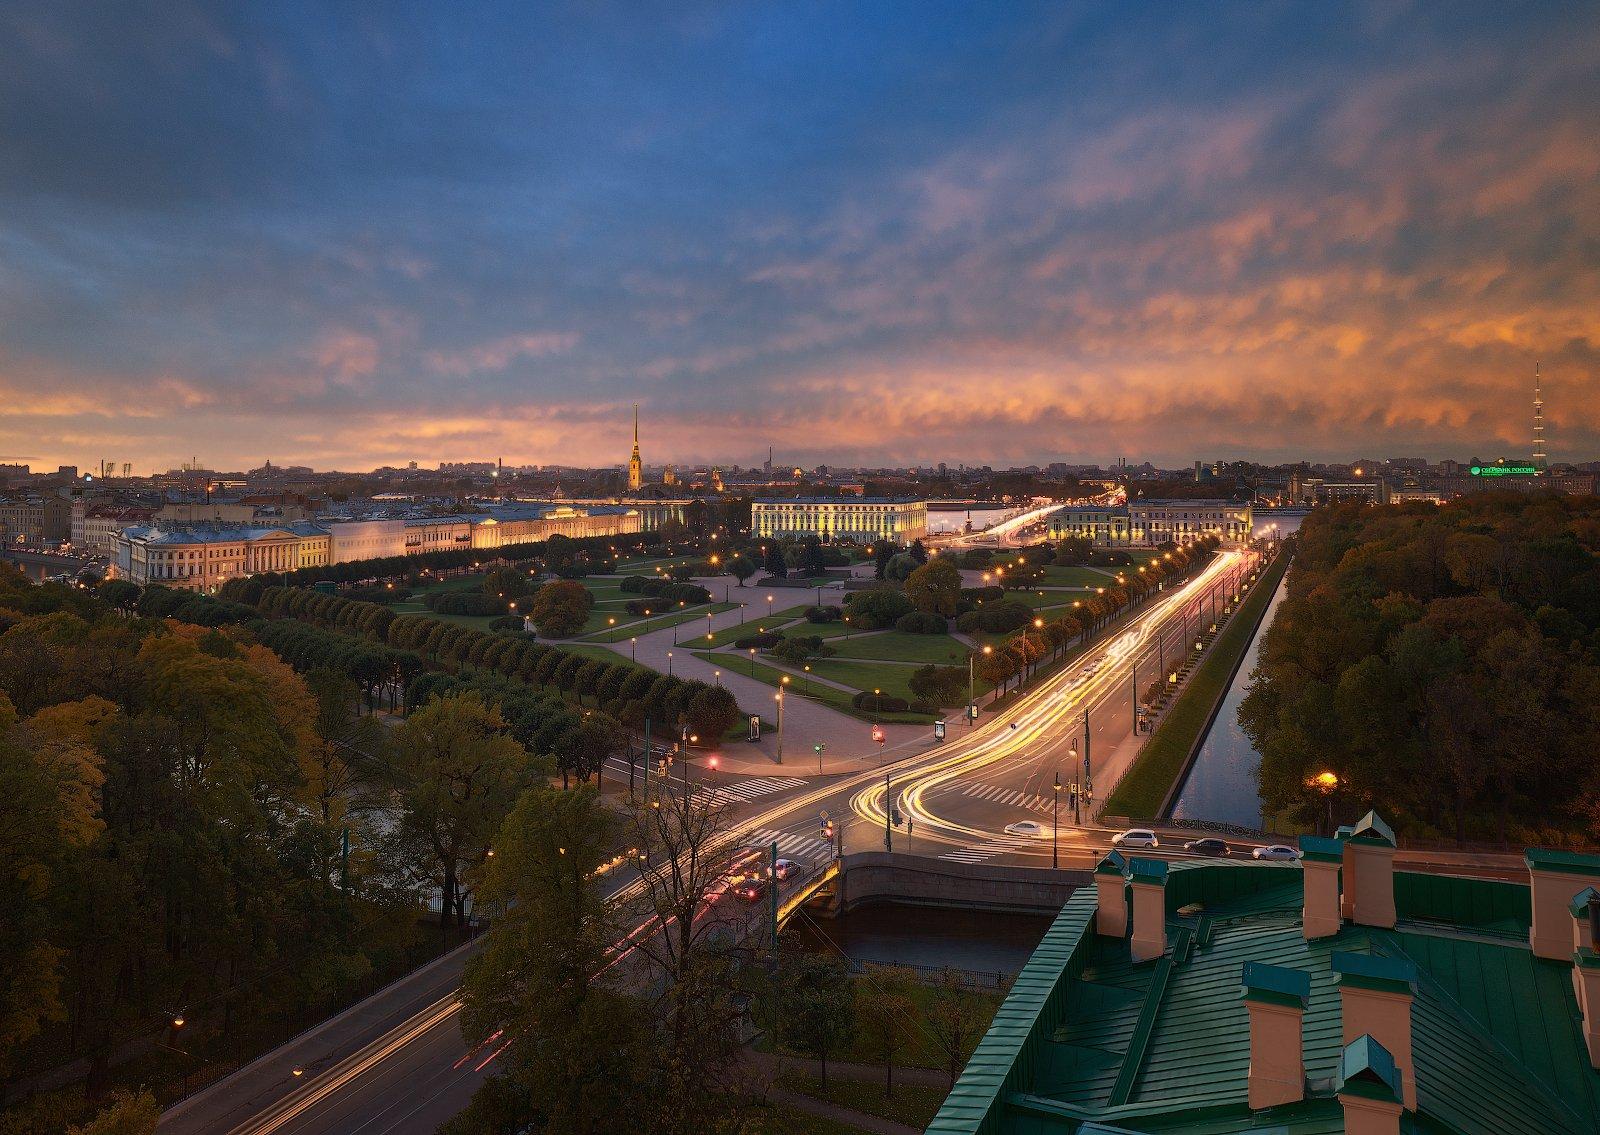 закат санкт-петербург собор поле, Лукс Сергей